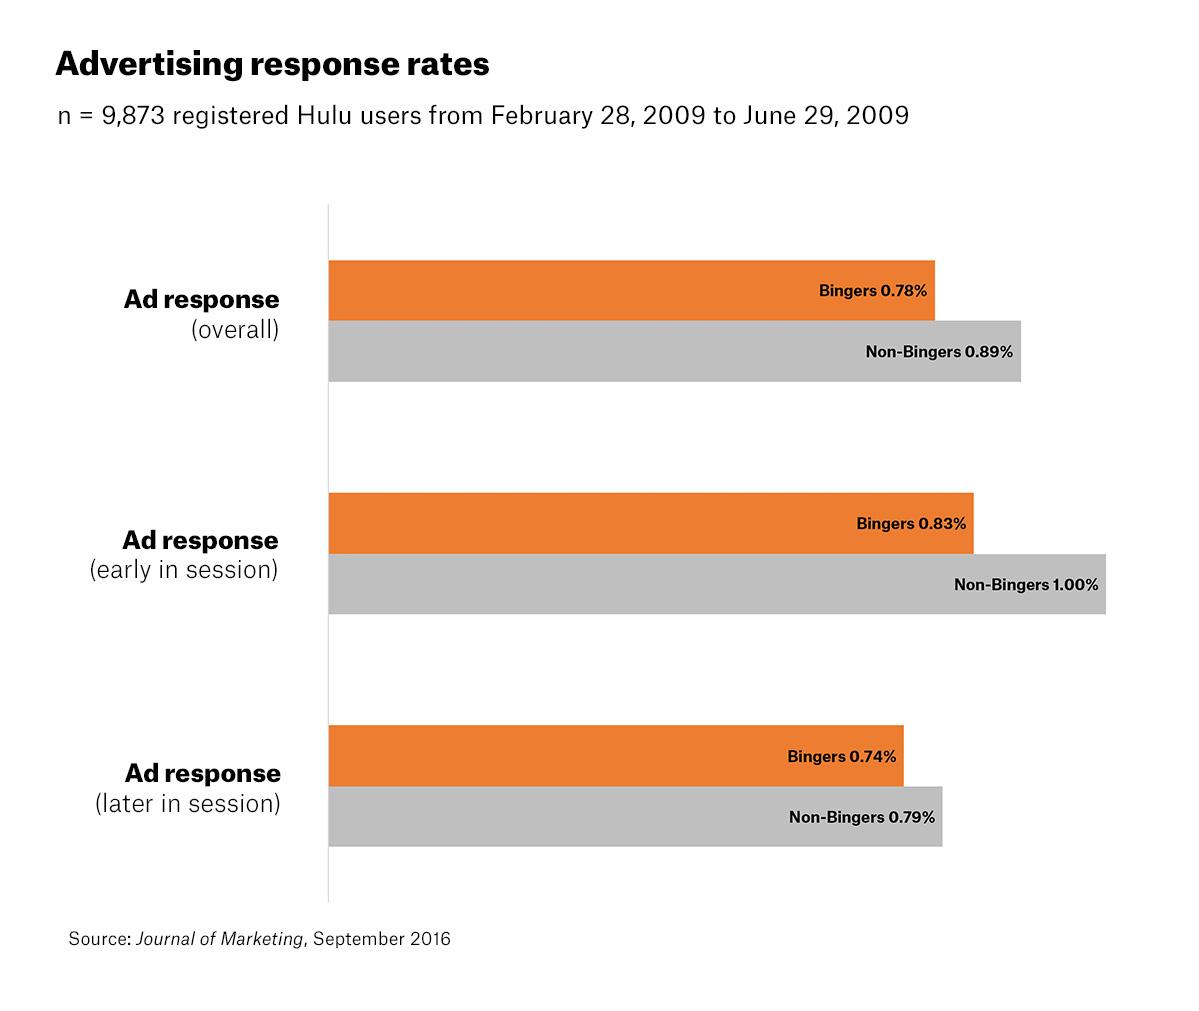 Binge ad response